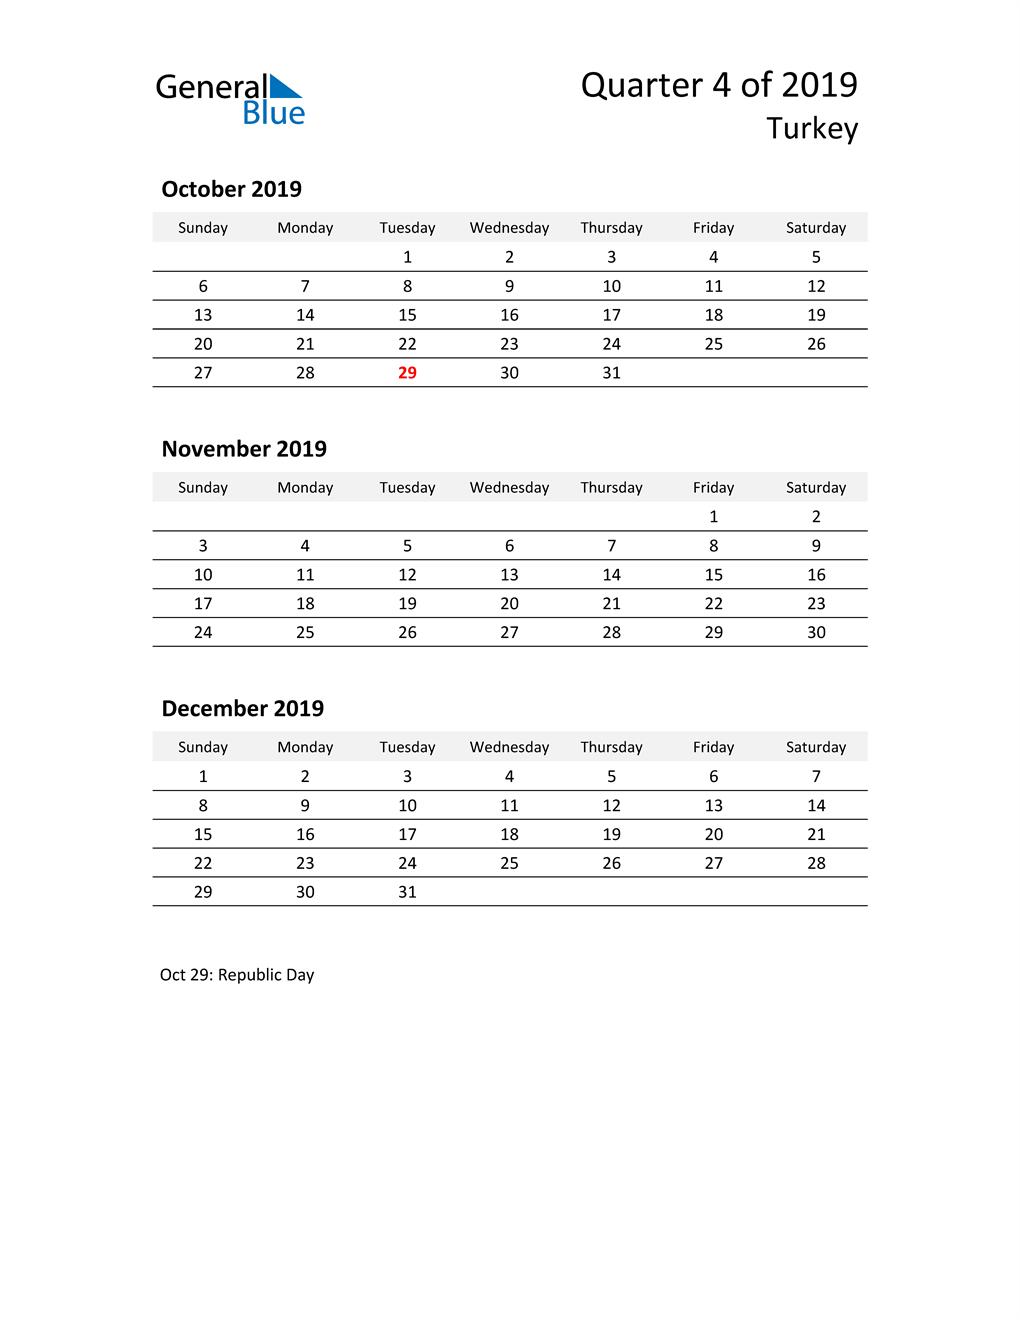 2019 Three-Month Calendar for Turkey